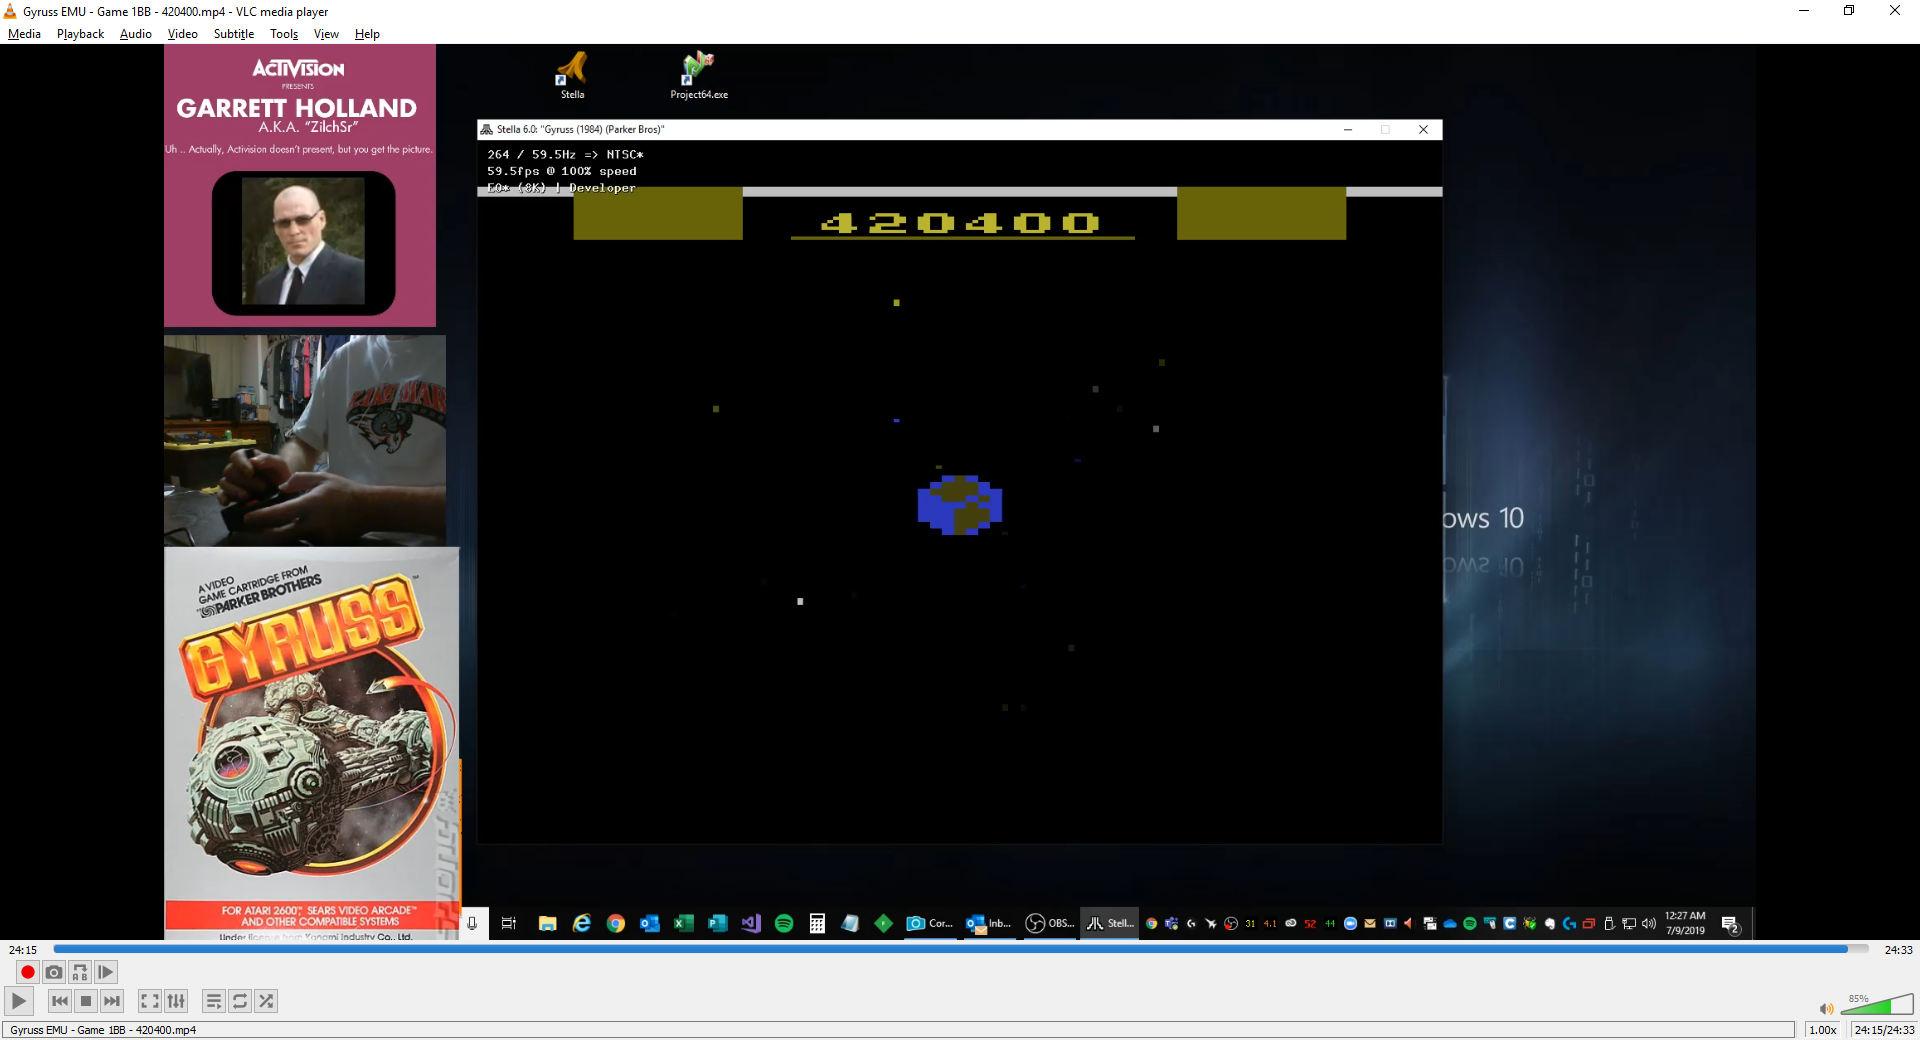 ZilchSr: Gyruss (Atari 2600 Emulated Novice/B Mode) 420,400 points on 2019-08-08 21:00:02